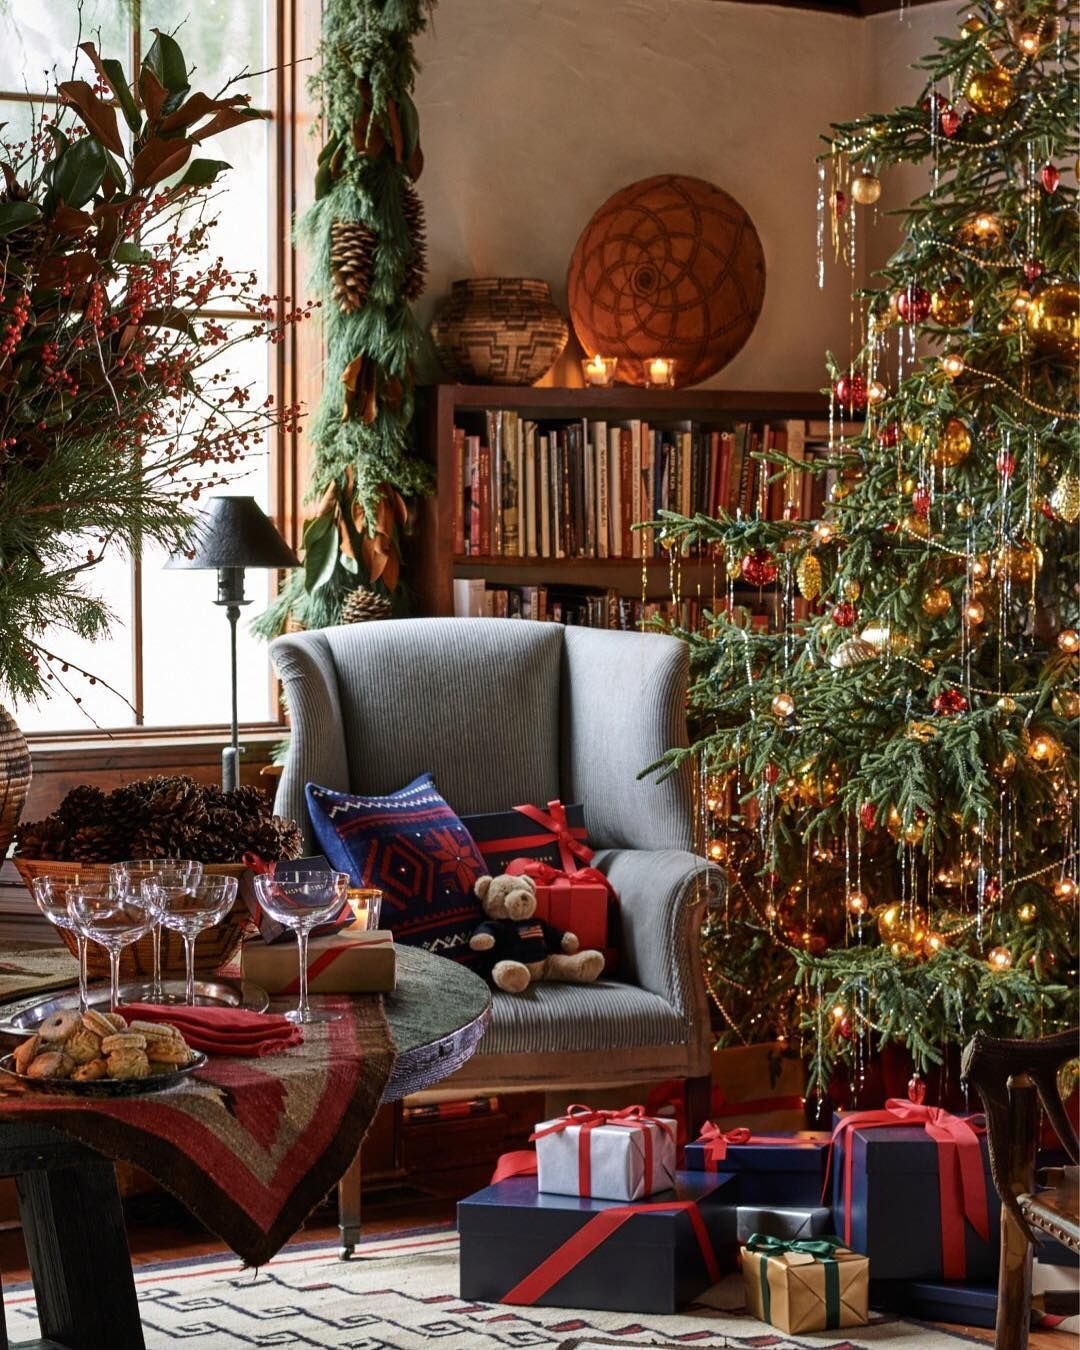 Ralph Lauren Home Ralphlaurenhome On Instagram A Ralphlaurenhome Retreat As Refined As I Christmas Interiors Christmas Home Classic Christmas Decorations